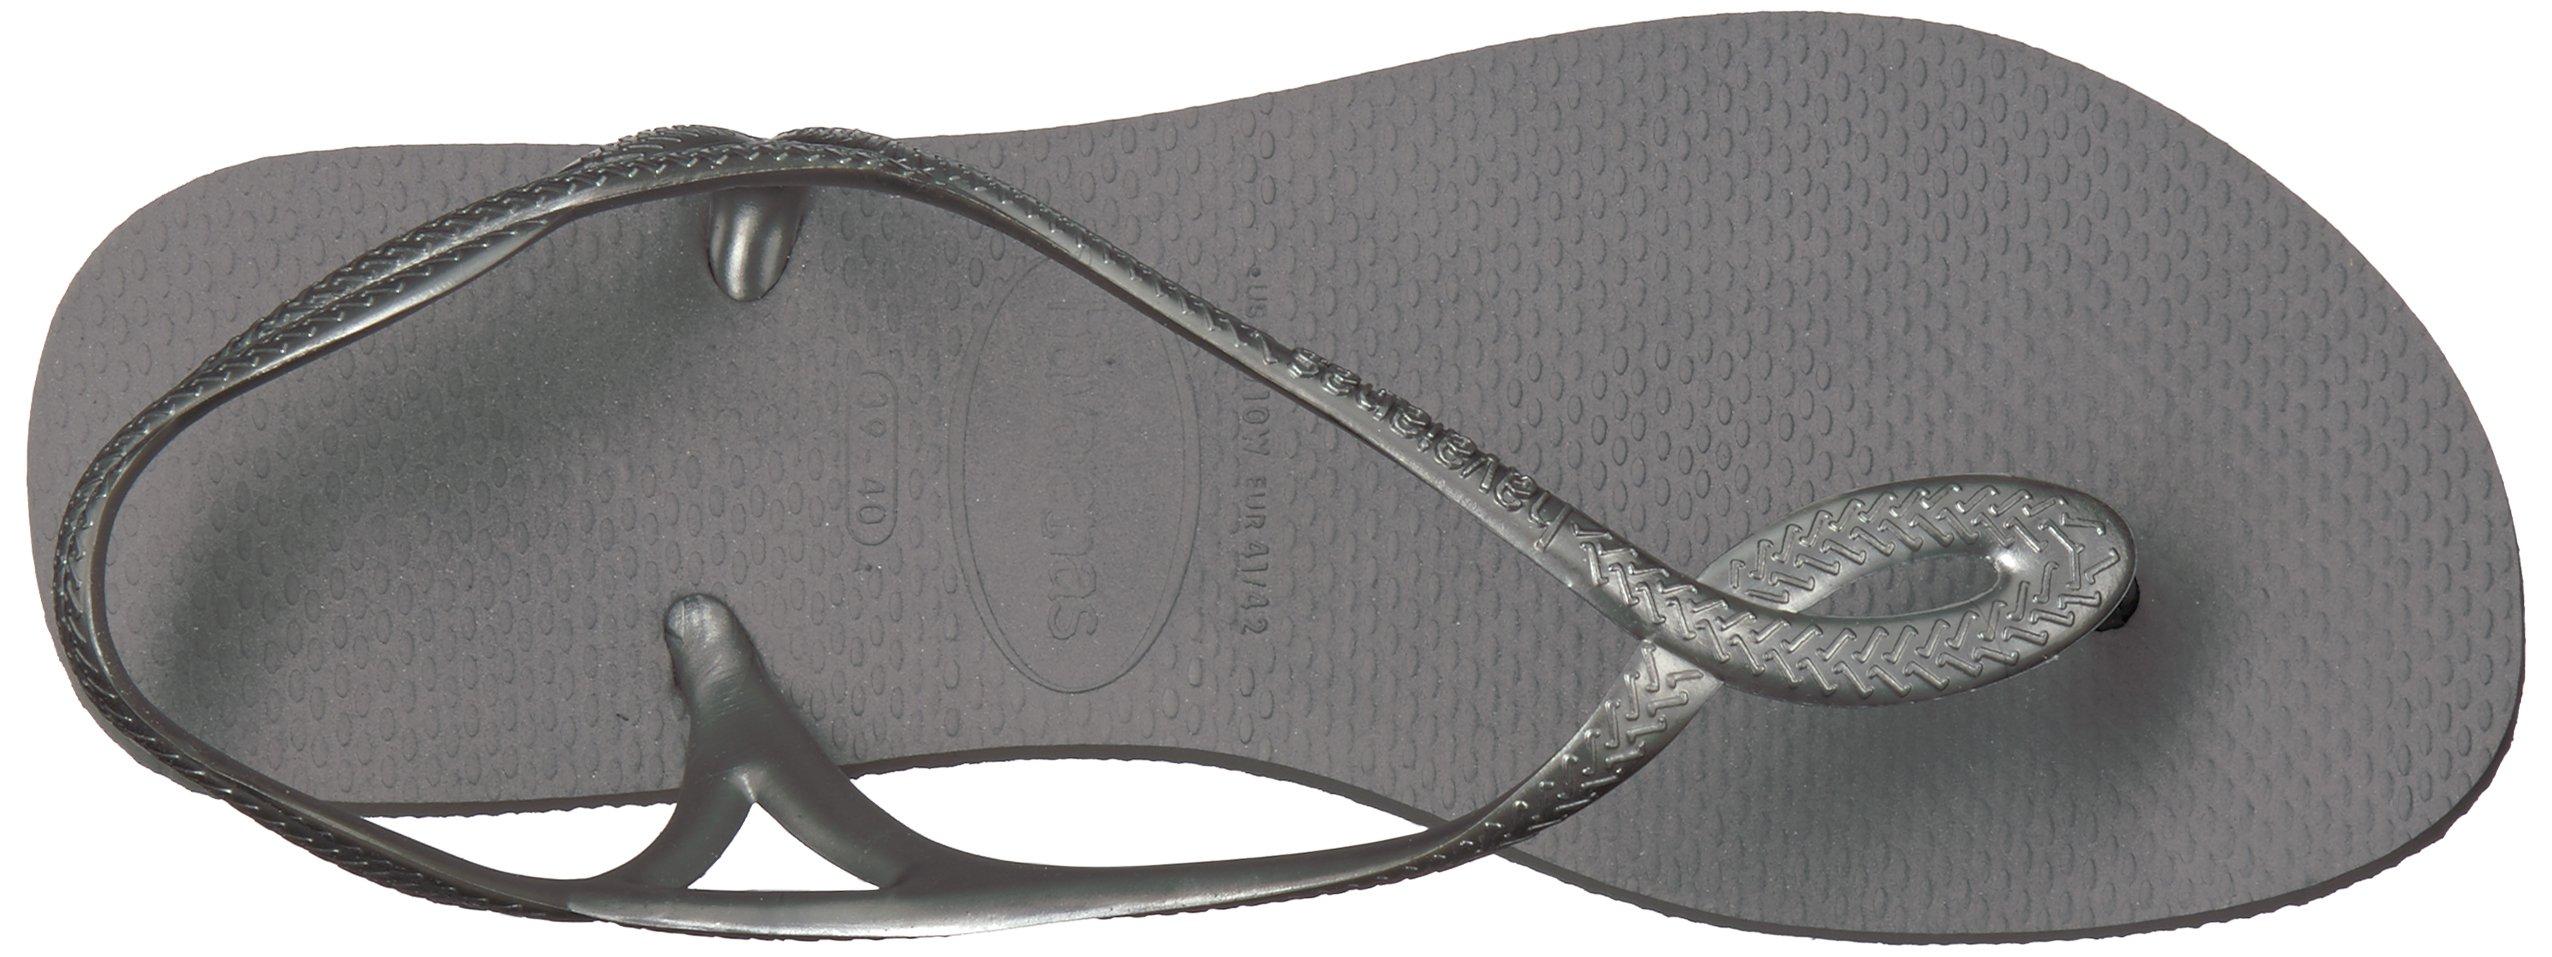 Havaianas Kids' Luna Flip Flop Around Ankle Straps, Roman Sandal, Steel Grey by Havaianas (Image #8)